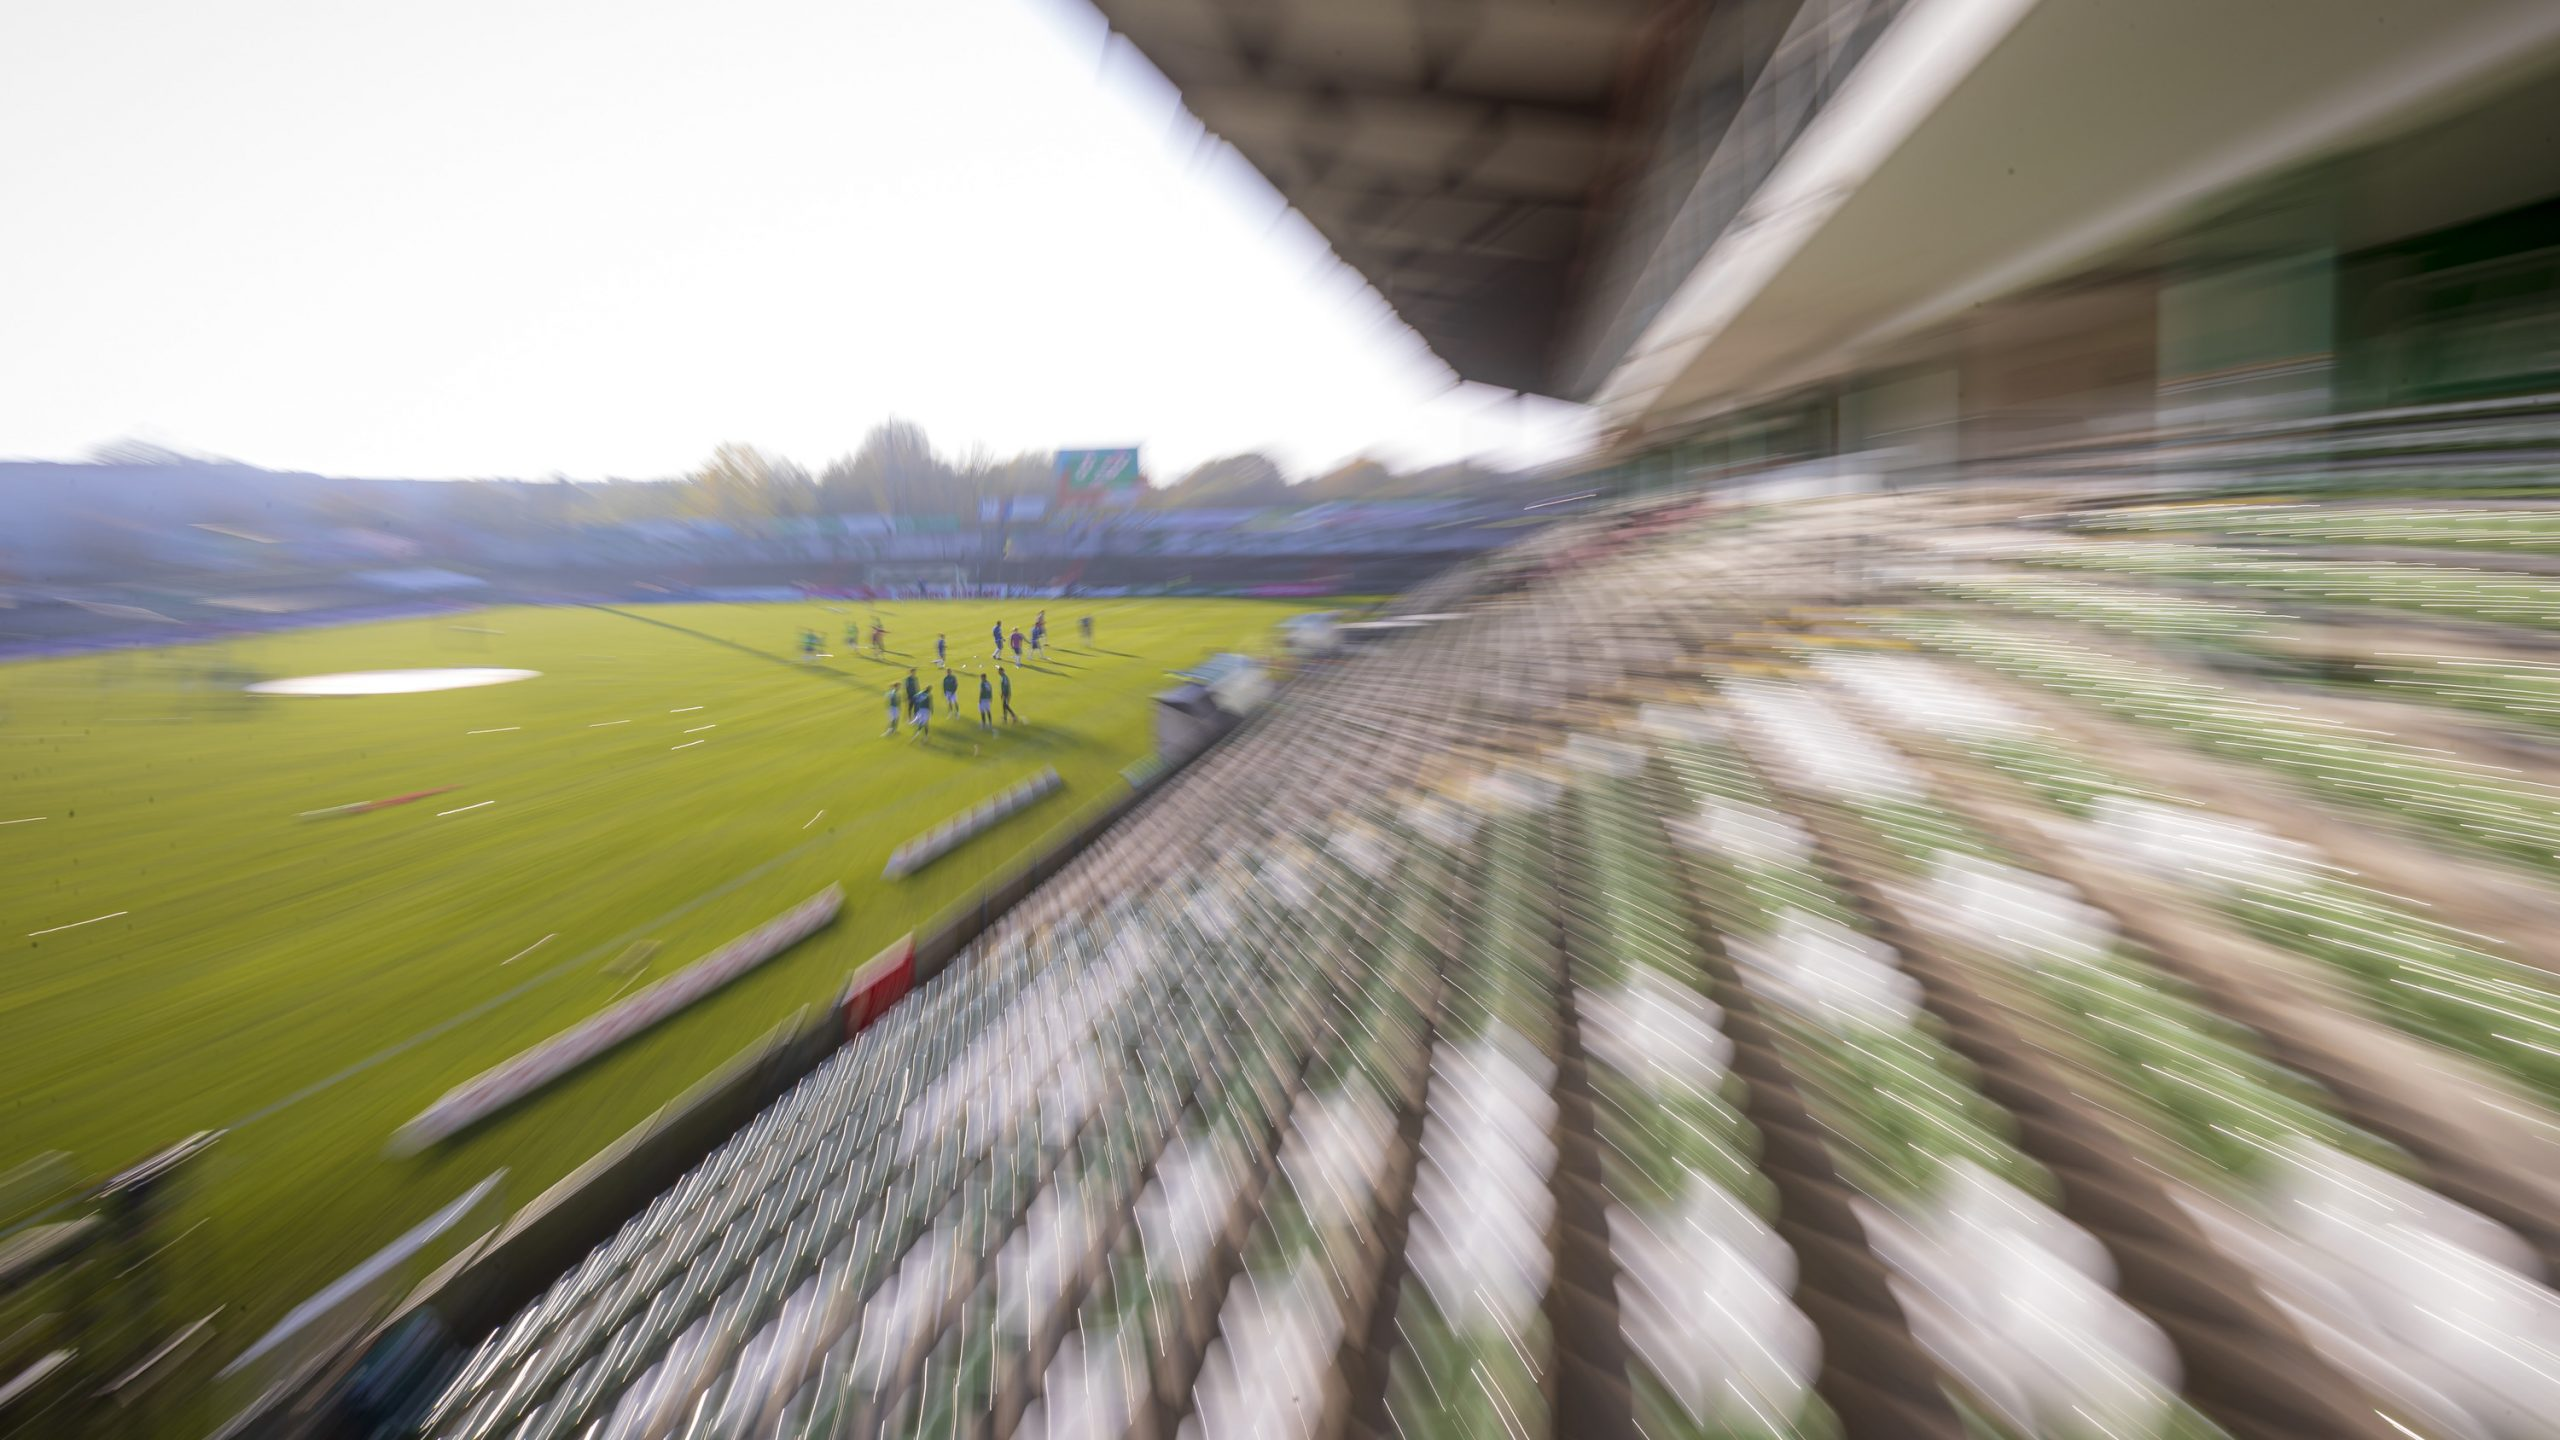 München hansa 9 Hansa Rostock: